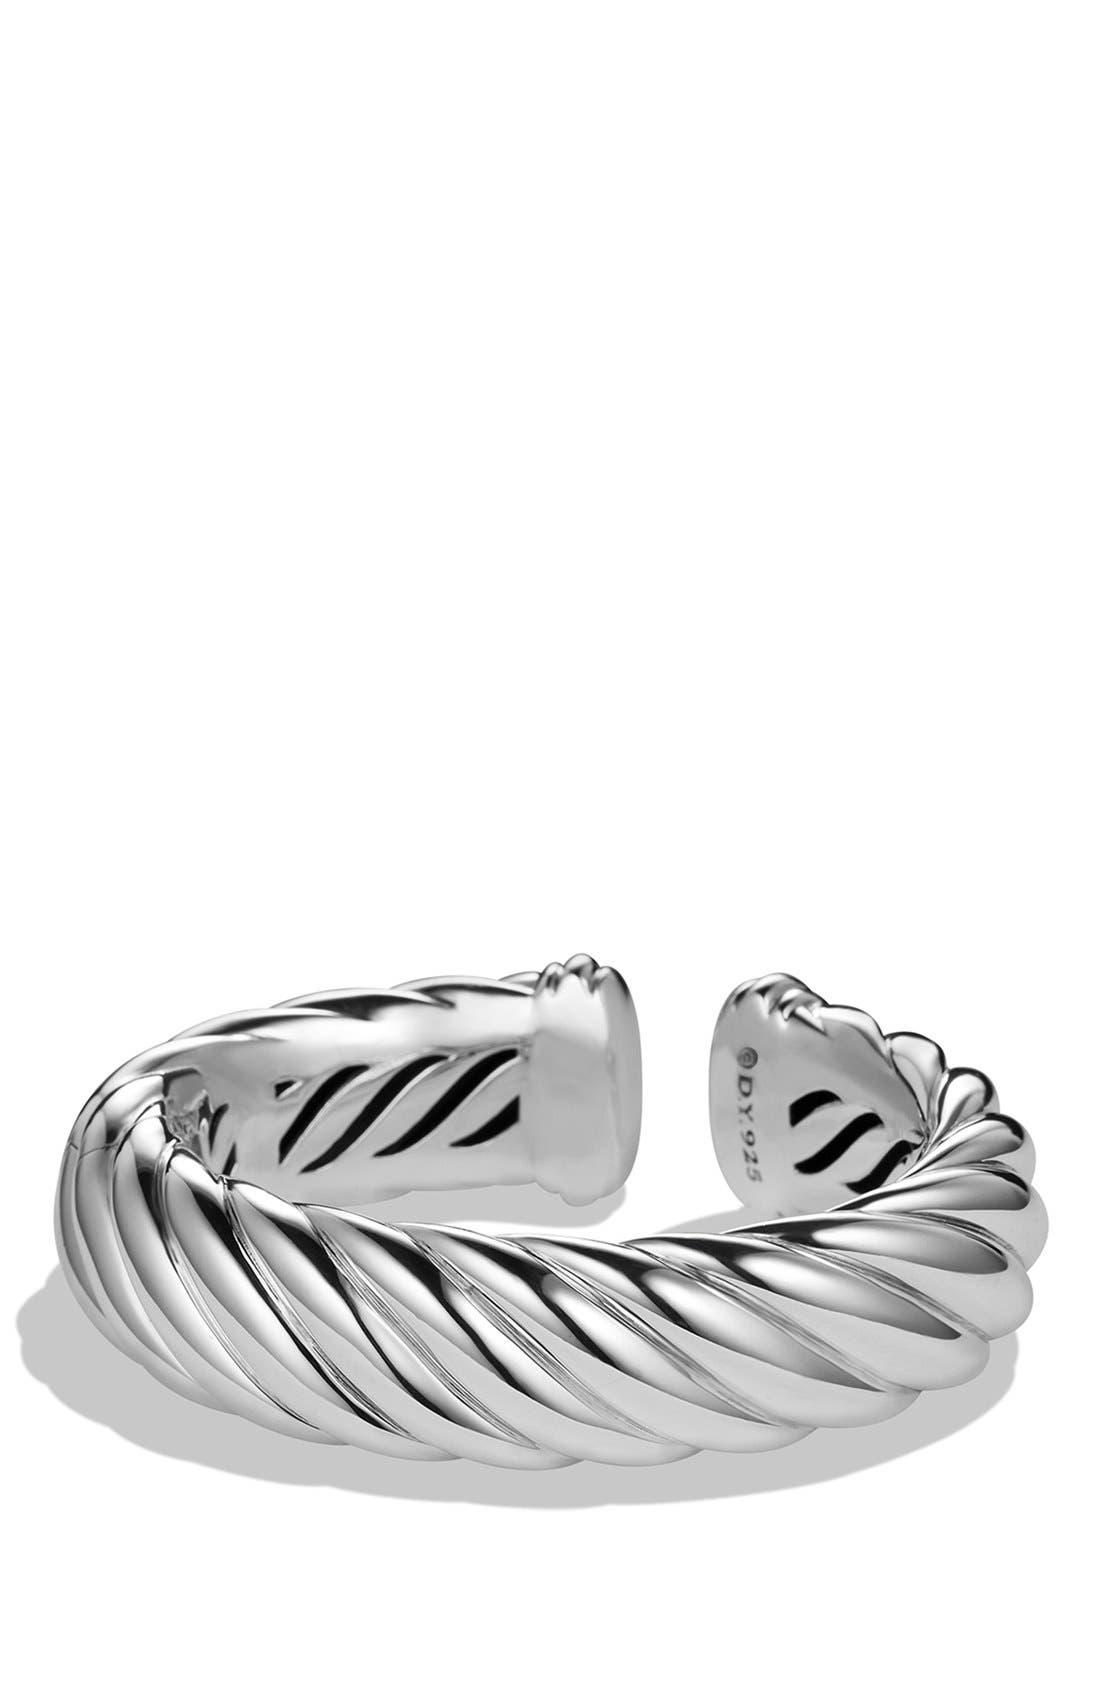 David Yurman 'Waverly' Bracelet